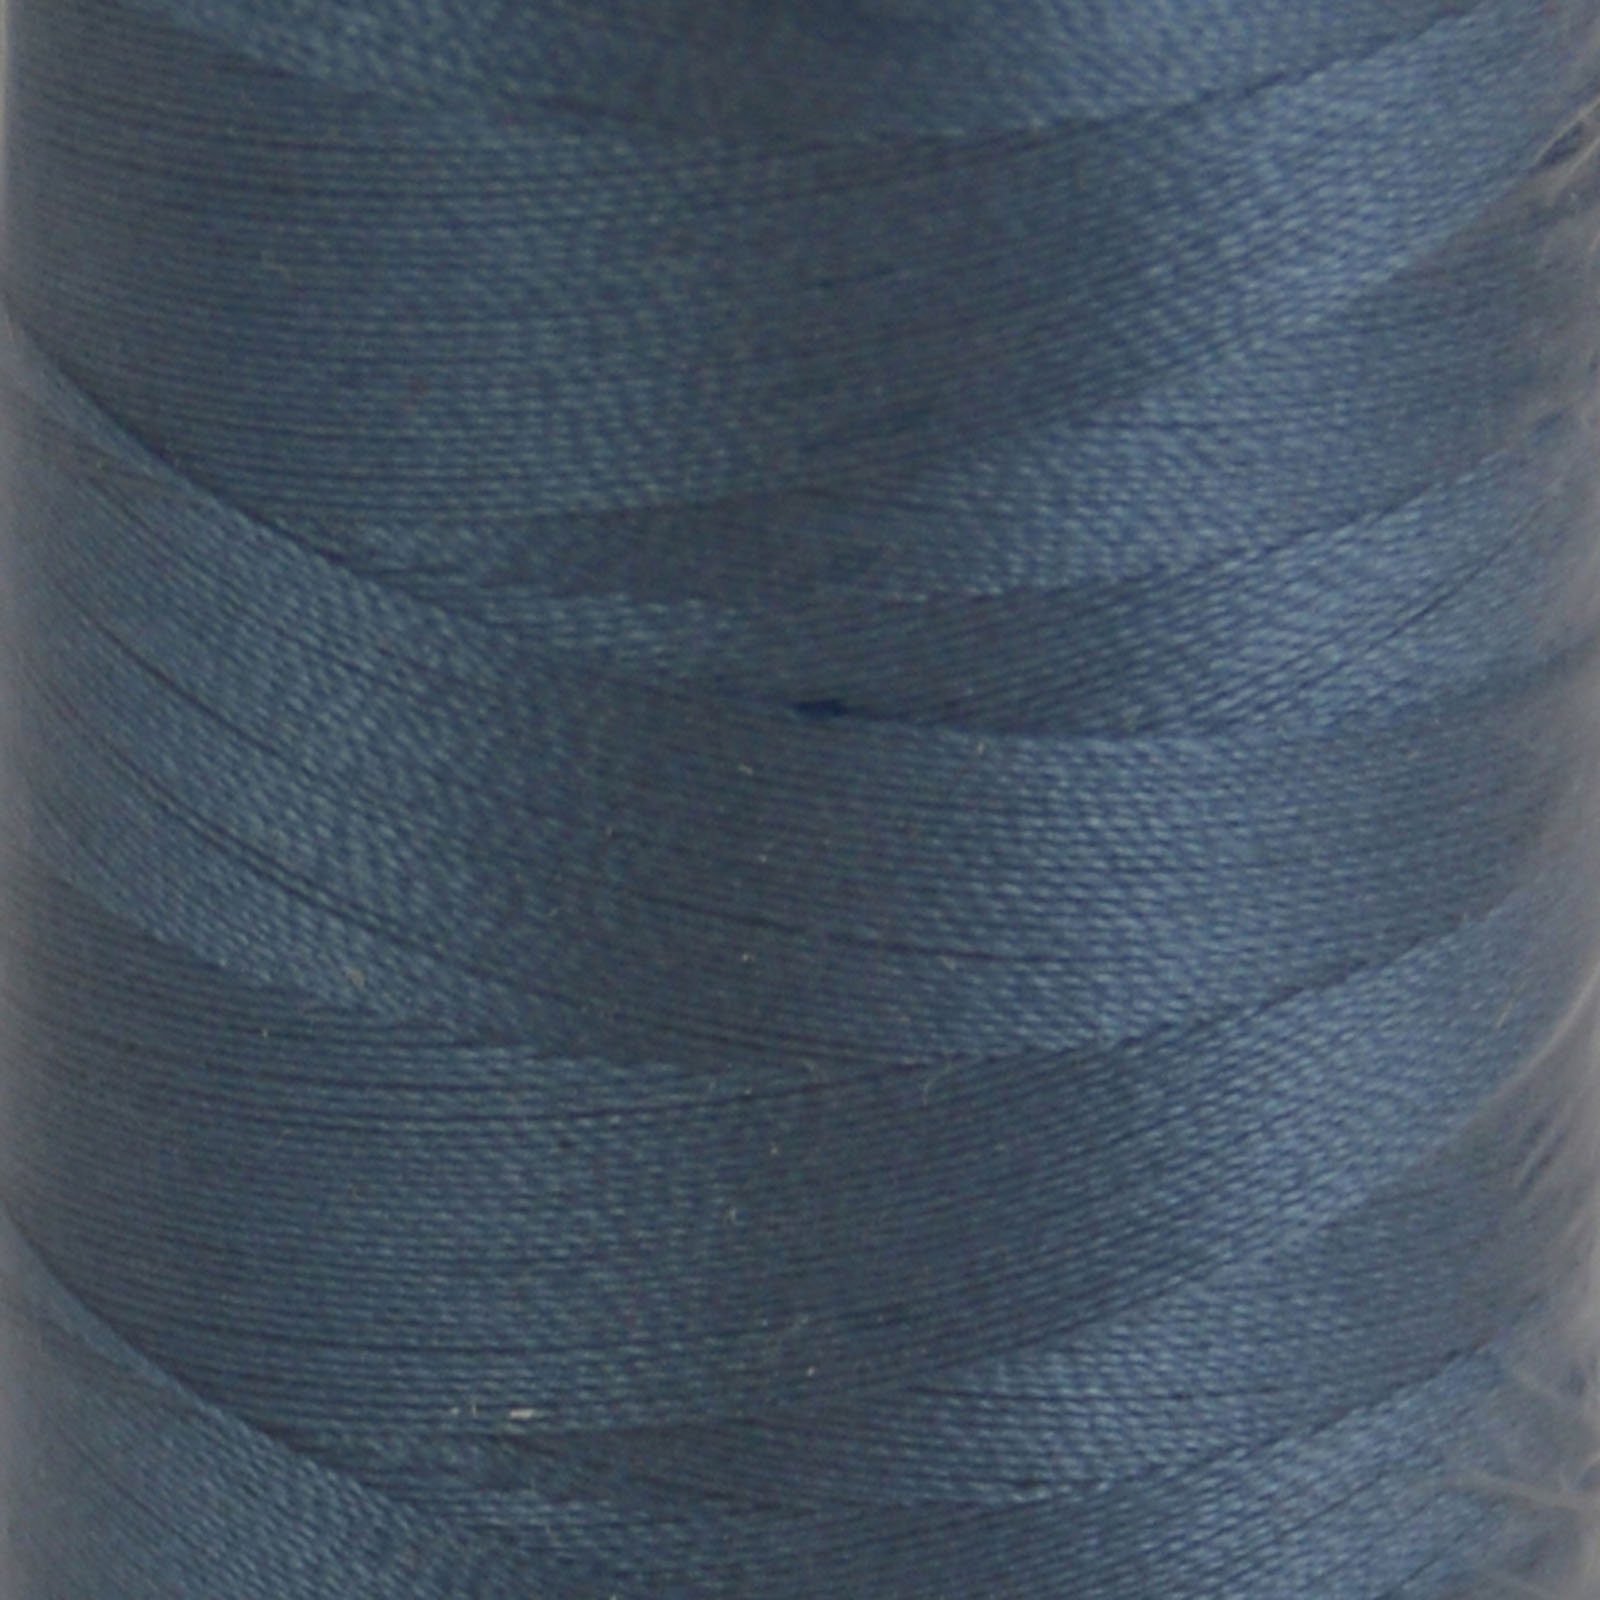 # 1310 Medium Blue Grey